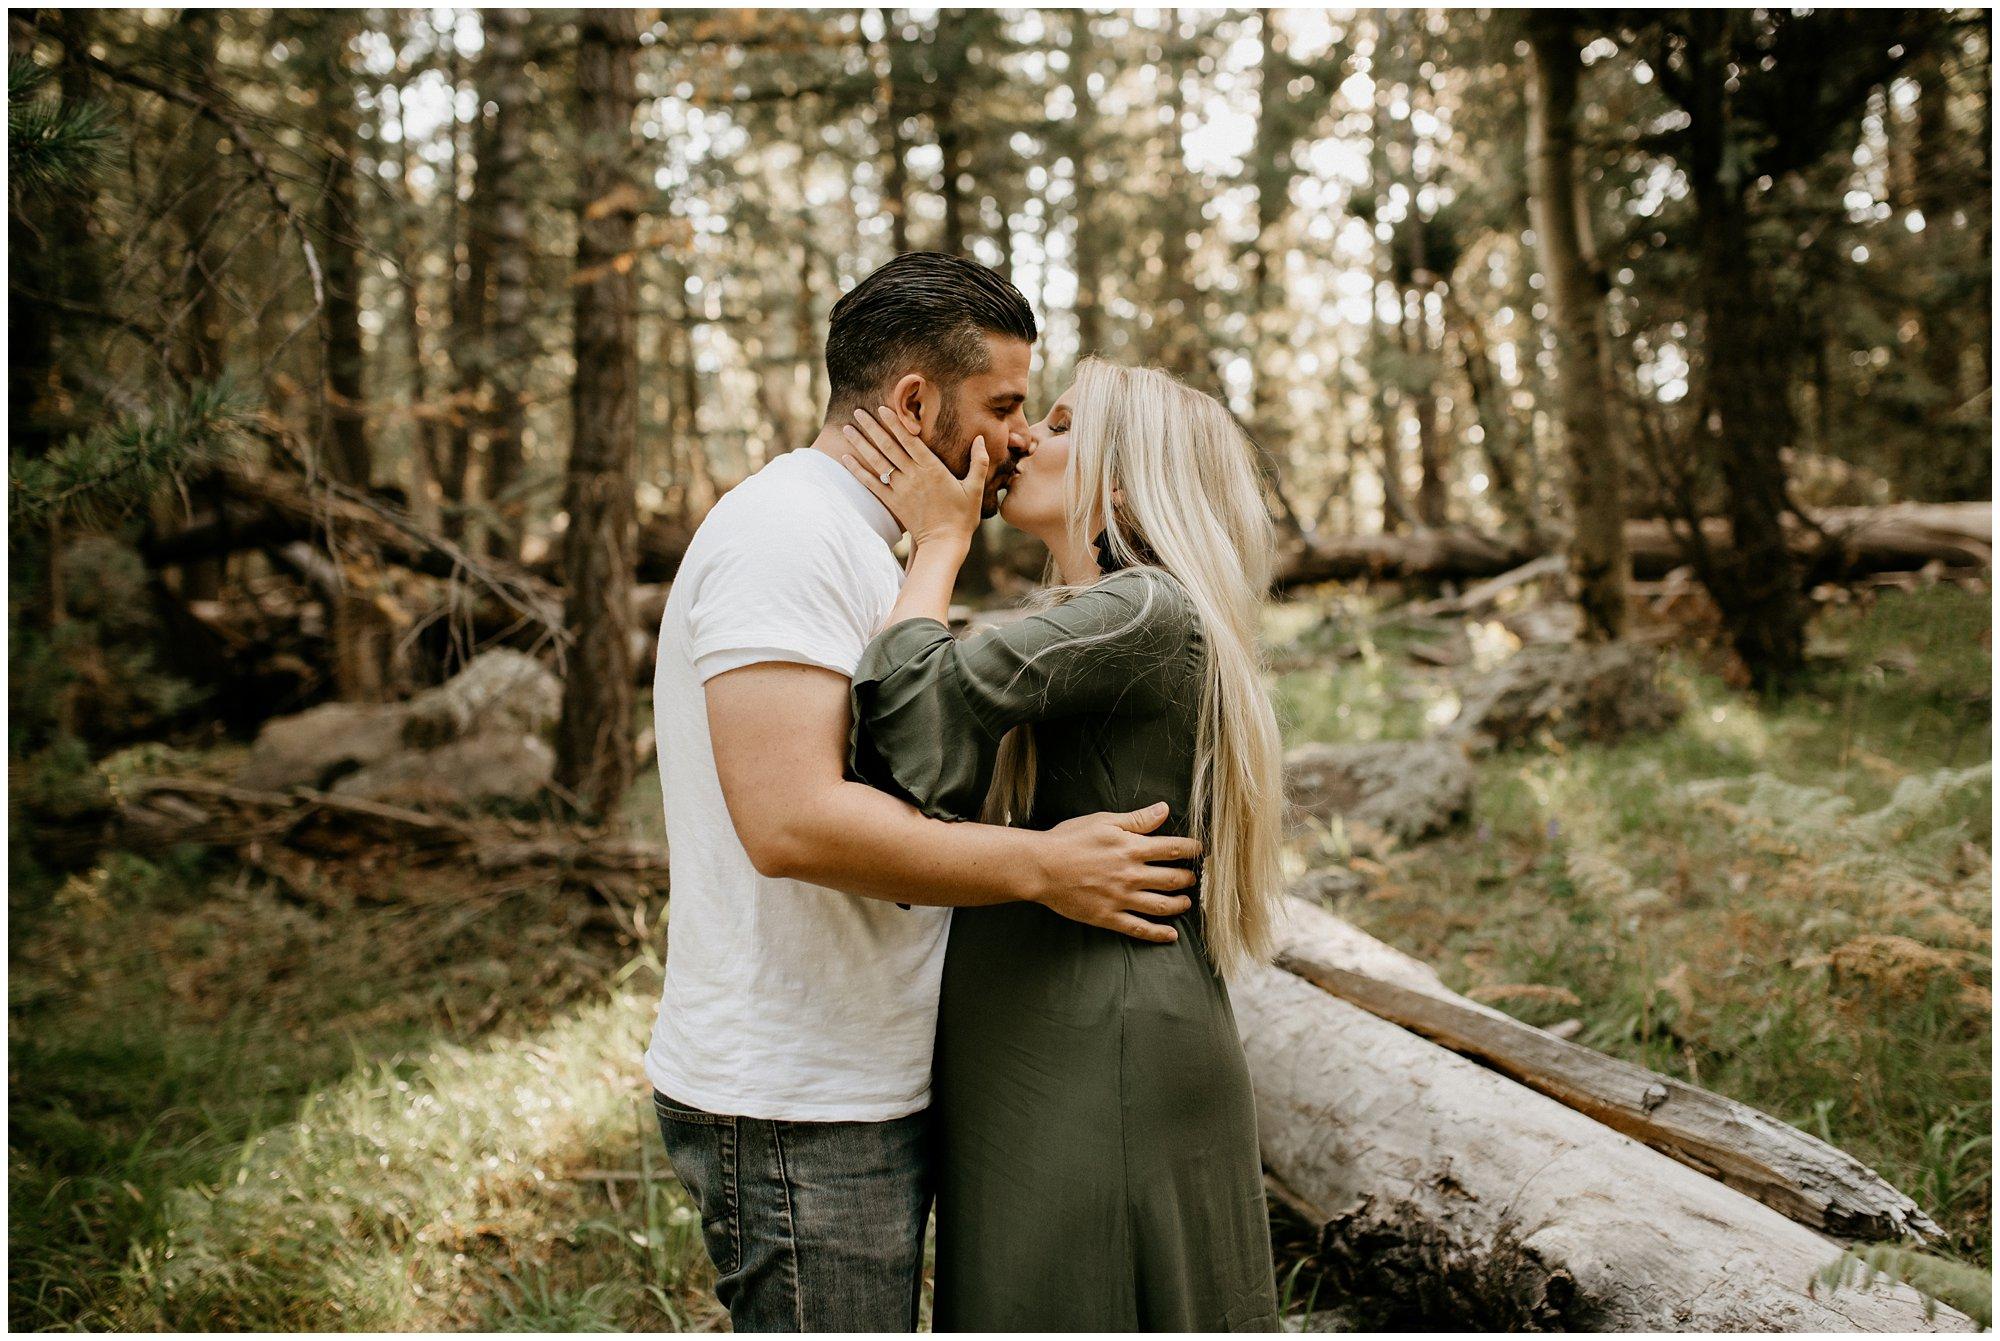 Flagstaff Aspen Tree Portrait Session - Gabby + Gary - Ashtyn Nicole Photo_0019.jpg